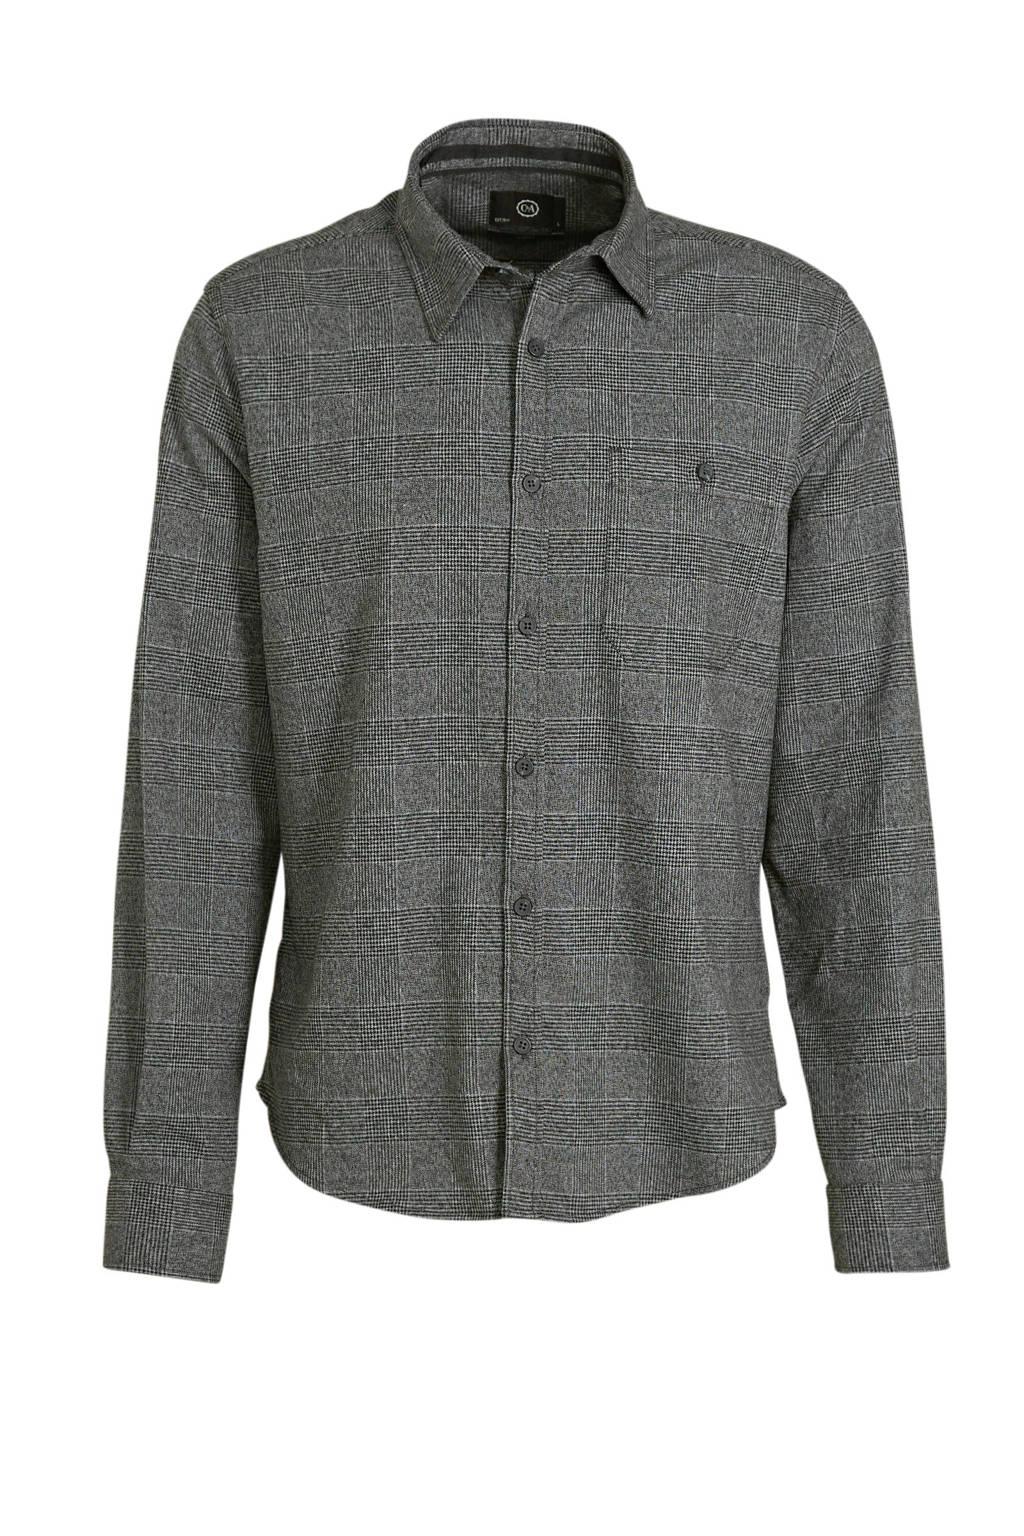 C&A Angelo Litrico geruit slim fit overhemd antraciet, Antraciet